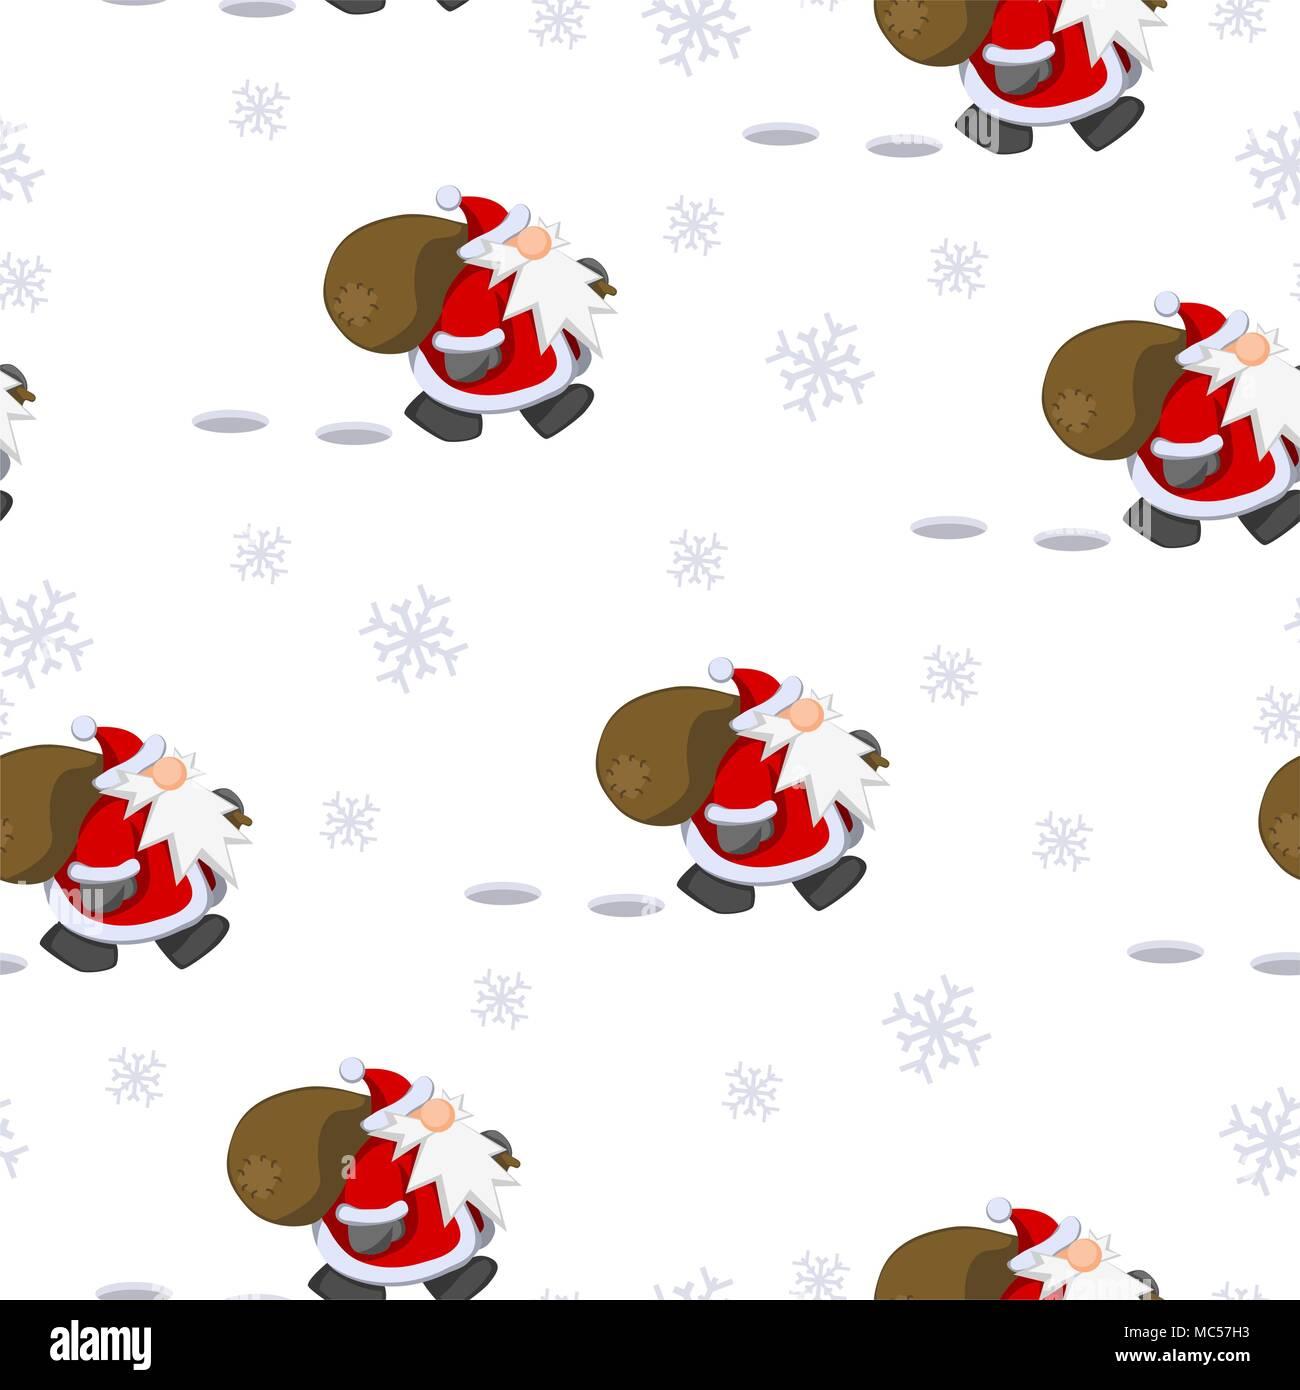 Cartoon Santa Claus Charakter Weihnachten fliesen Tapeten Muster ...